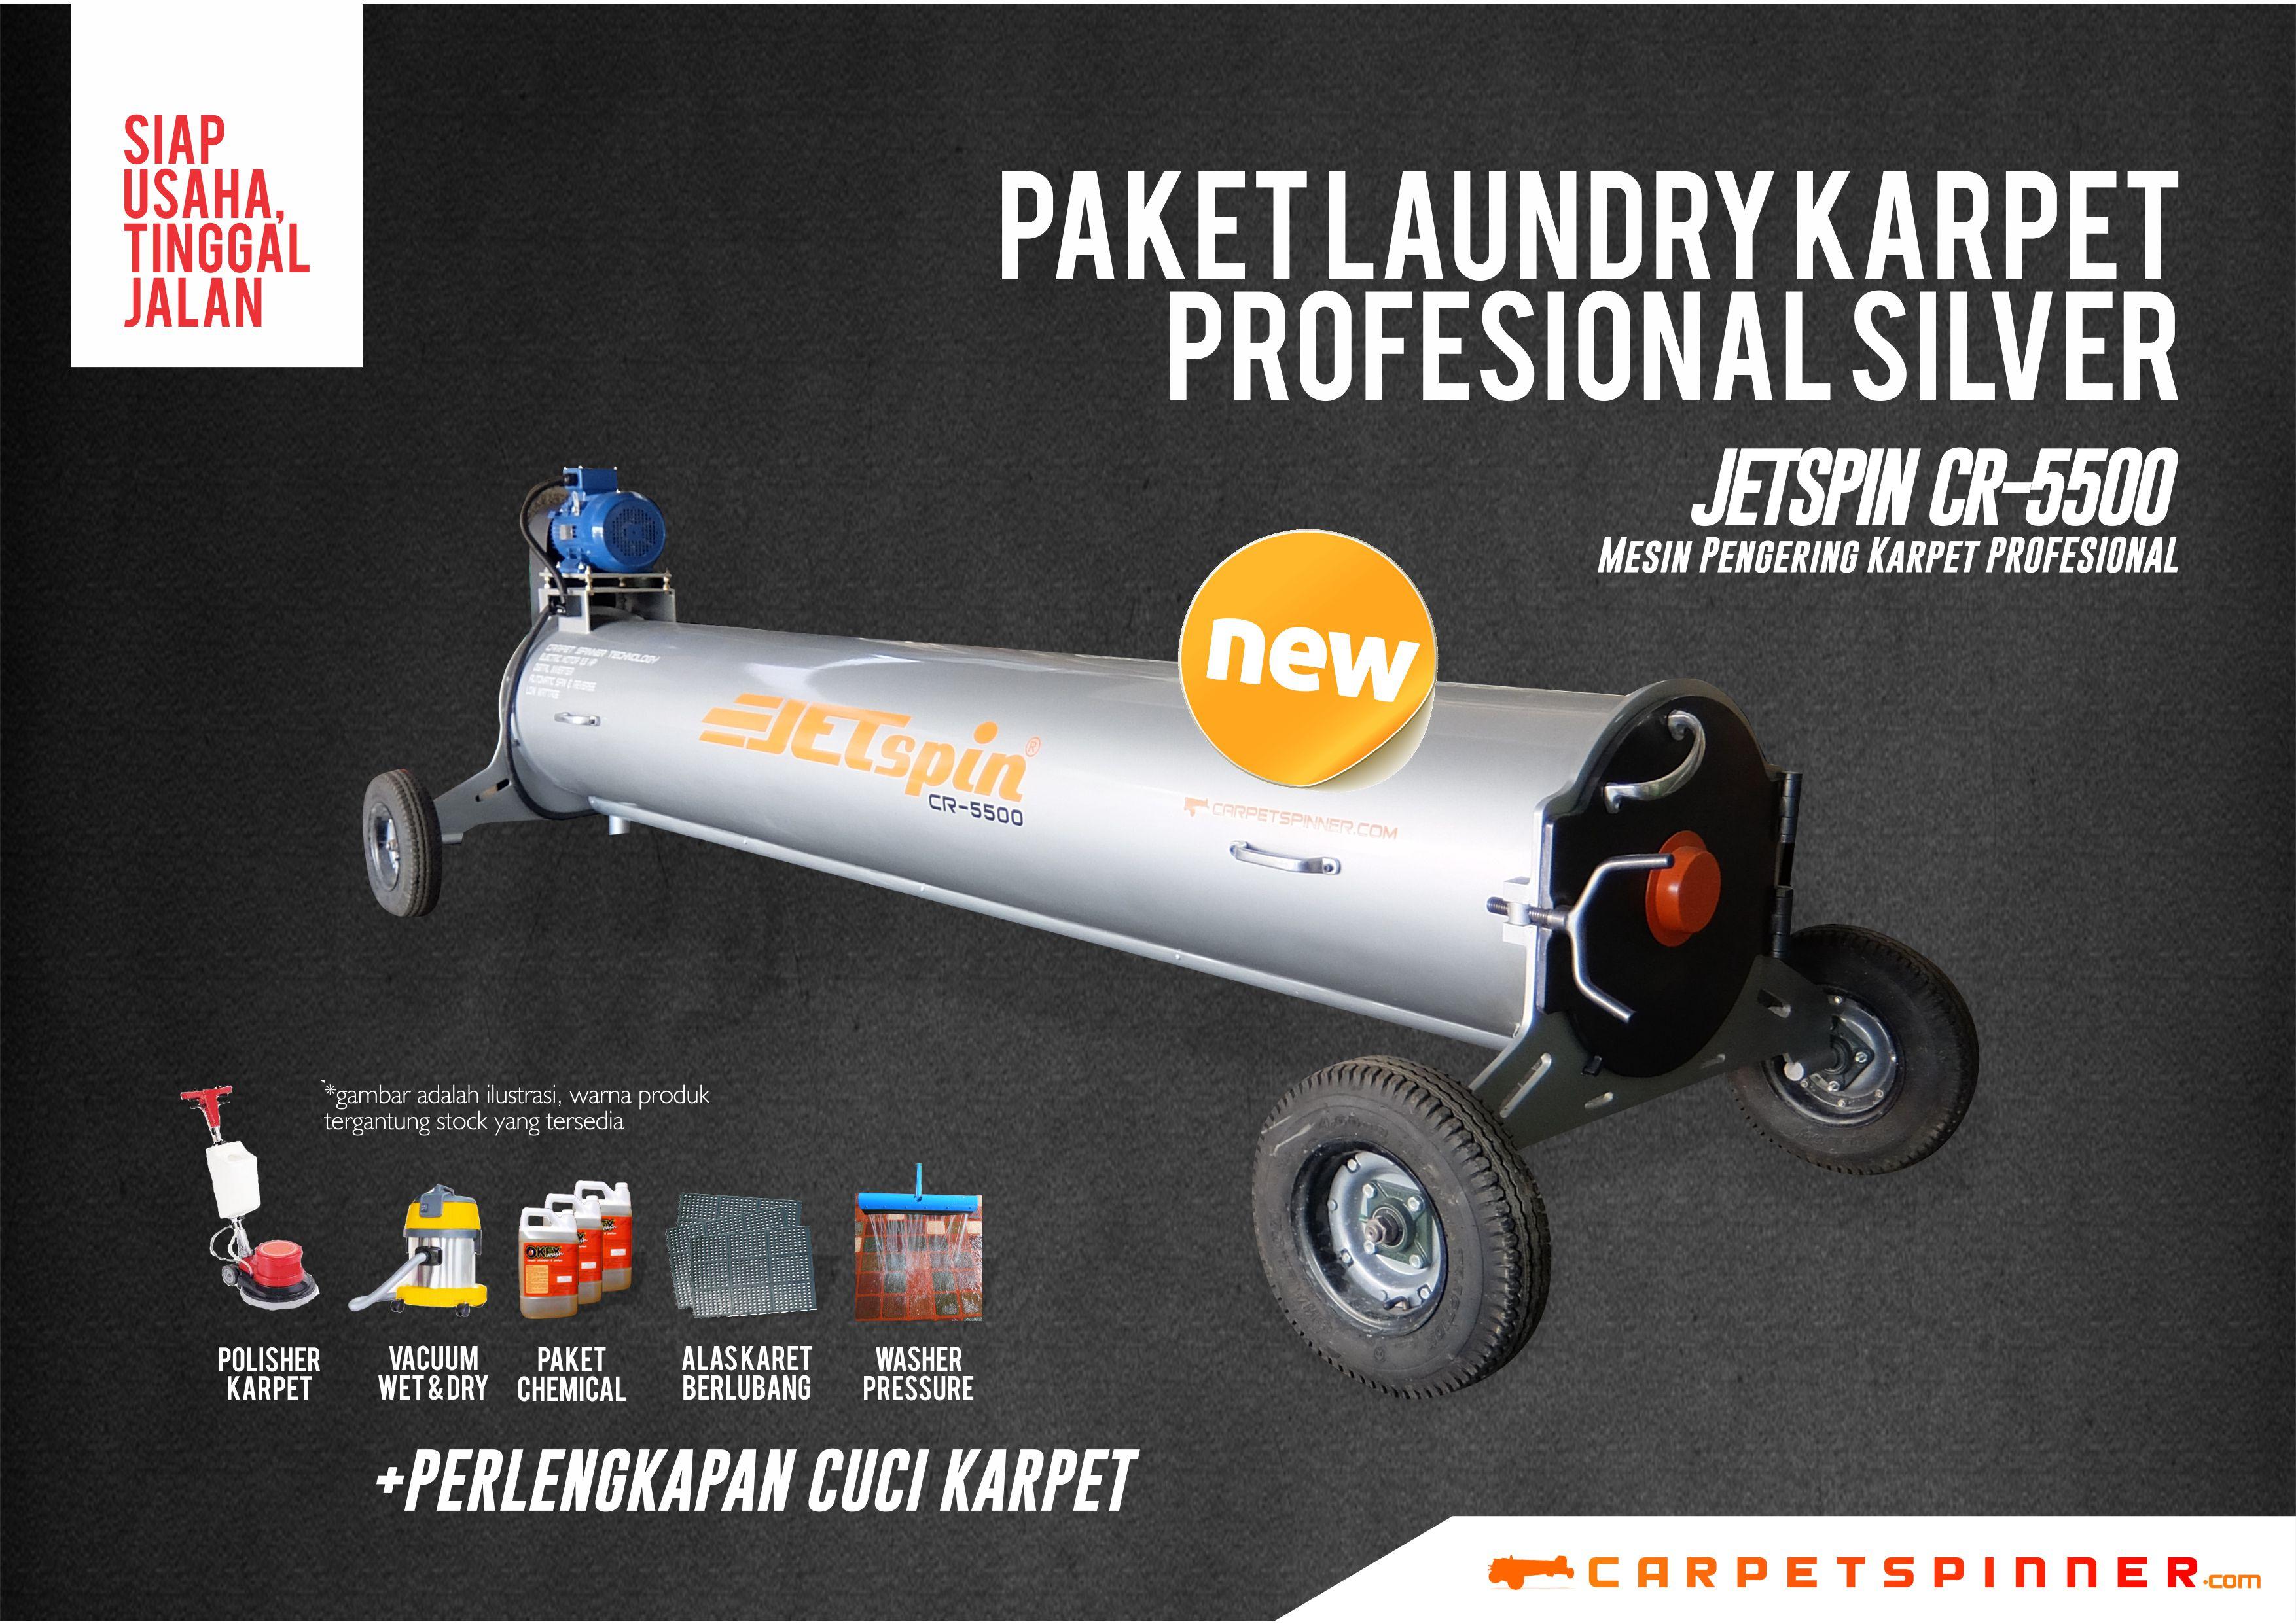 Paket Laundry Karpet Profesional JETSpin CR-5500 Silver Carpet Spinner 2019